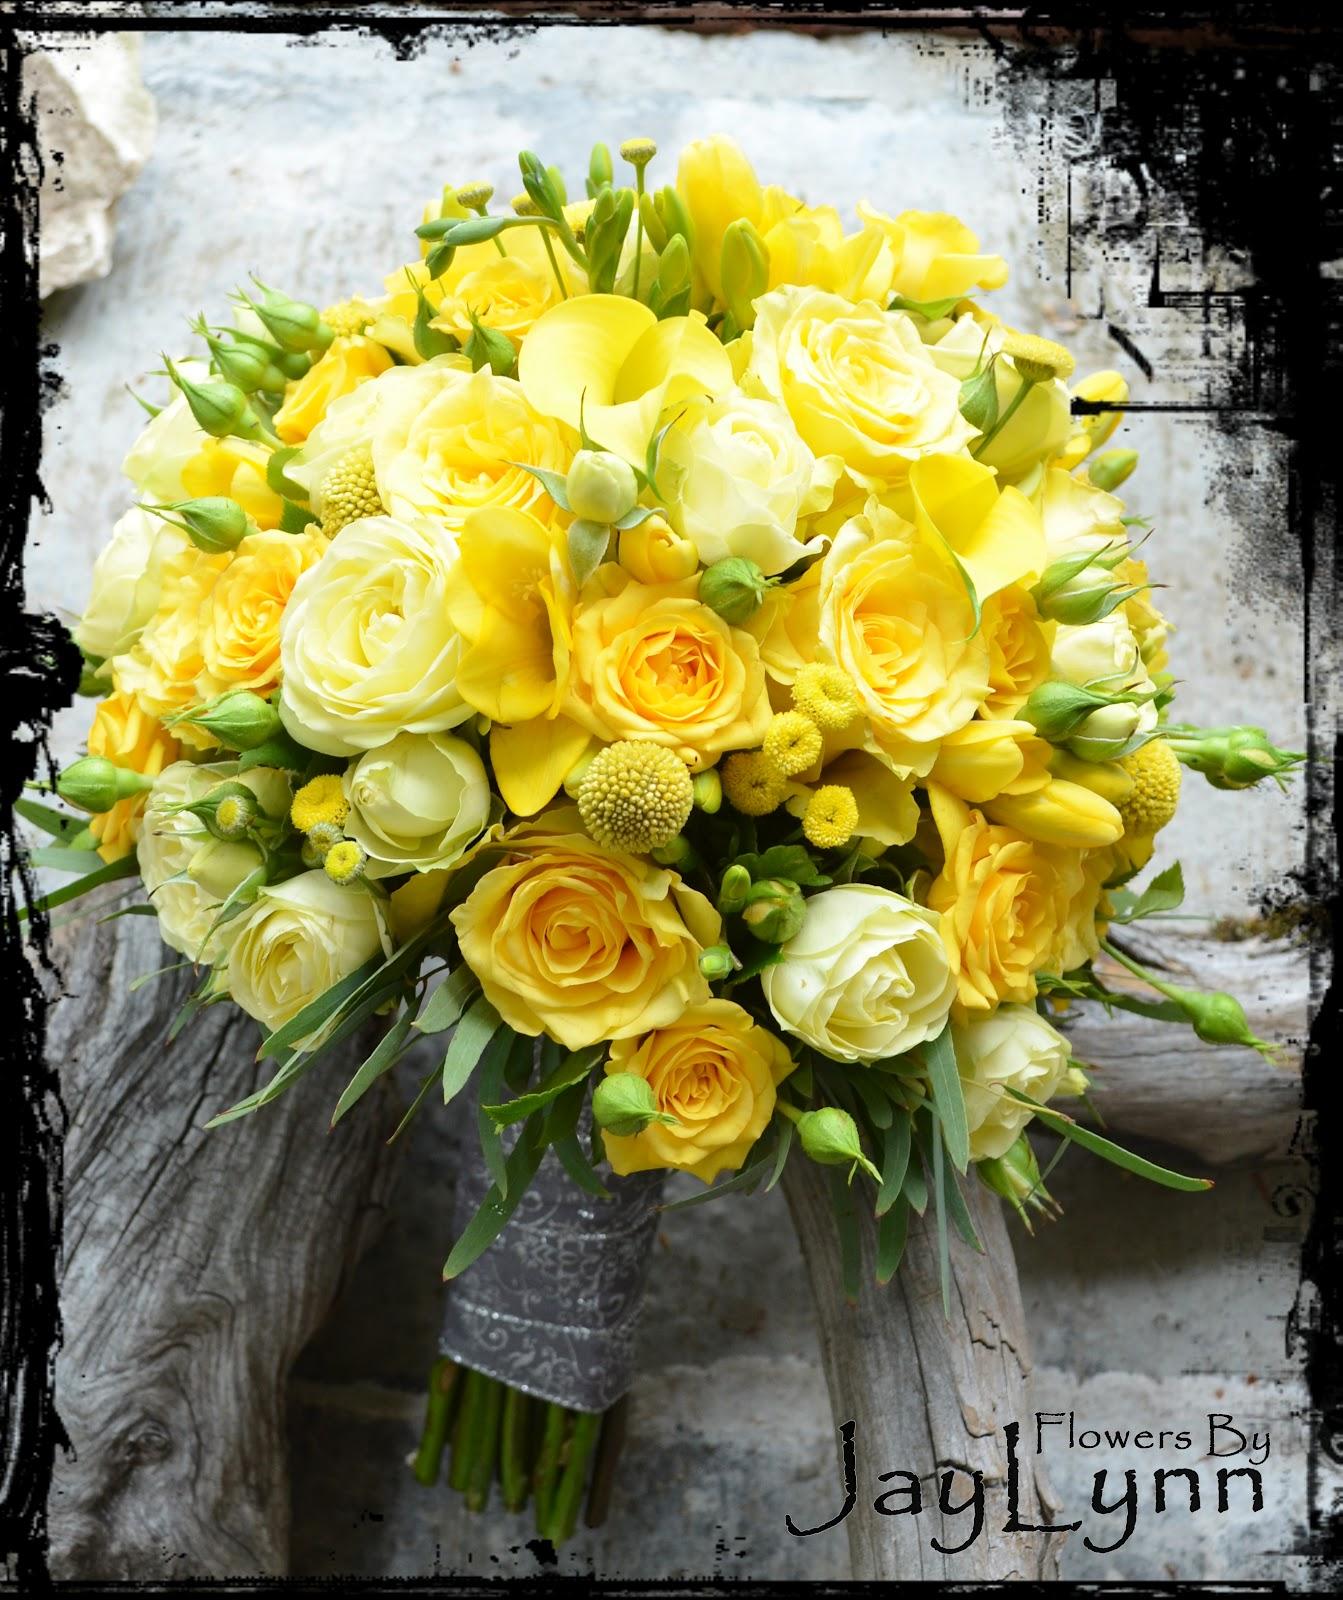 June Wedding Flowers: Flowers By JayLynn: Kay Wedding June 30th 2012